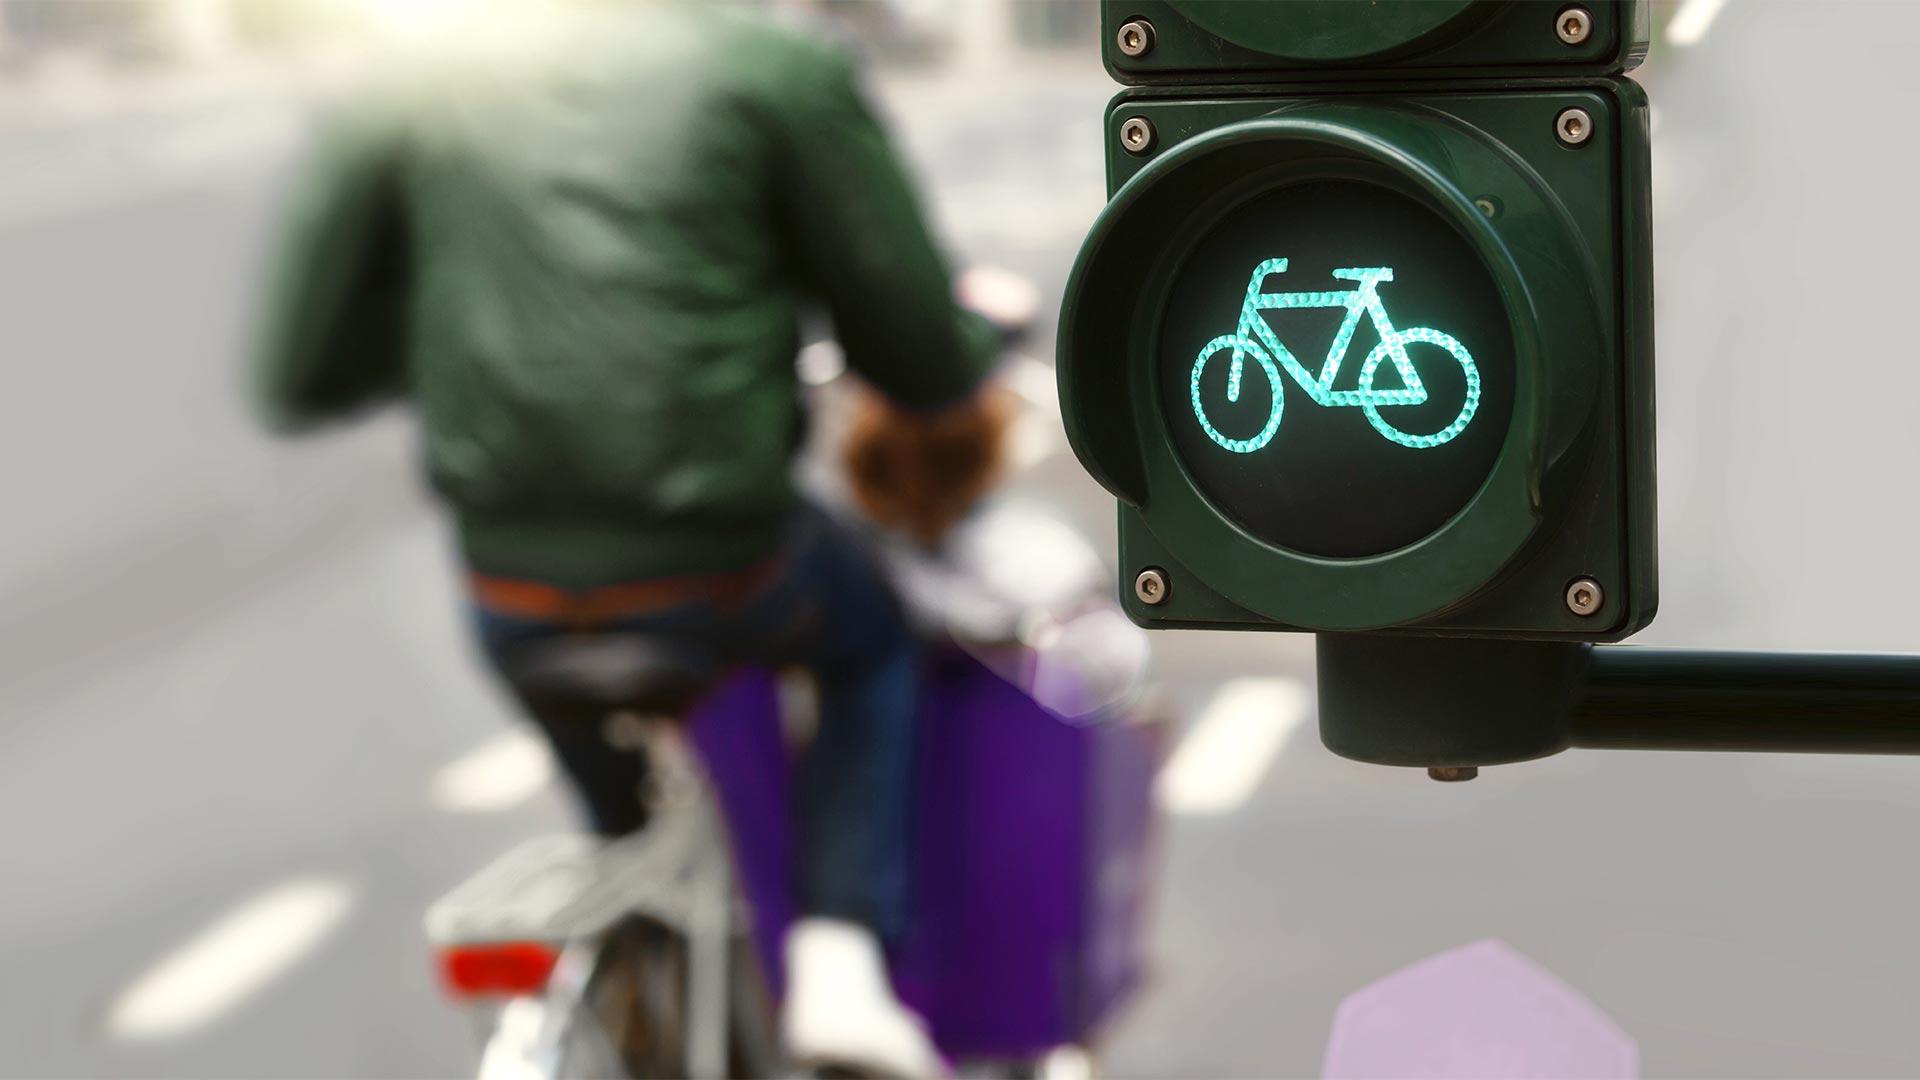 e-Lastenrad im Straßenverkehr